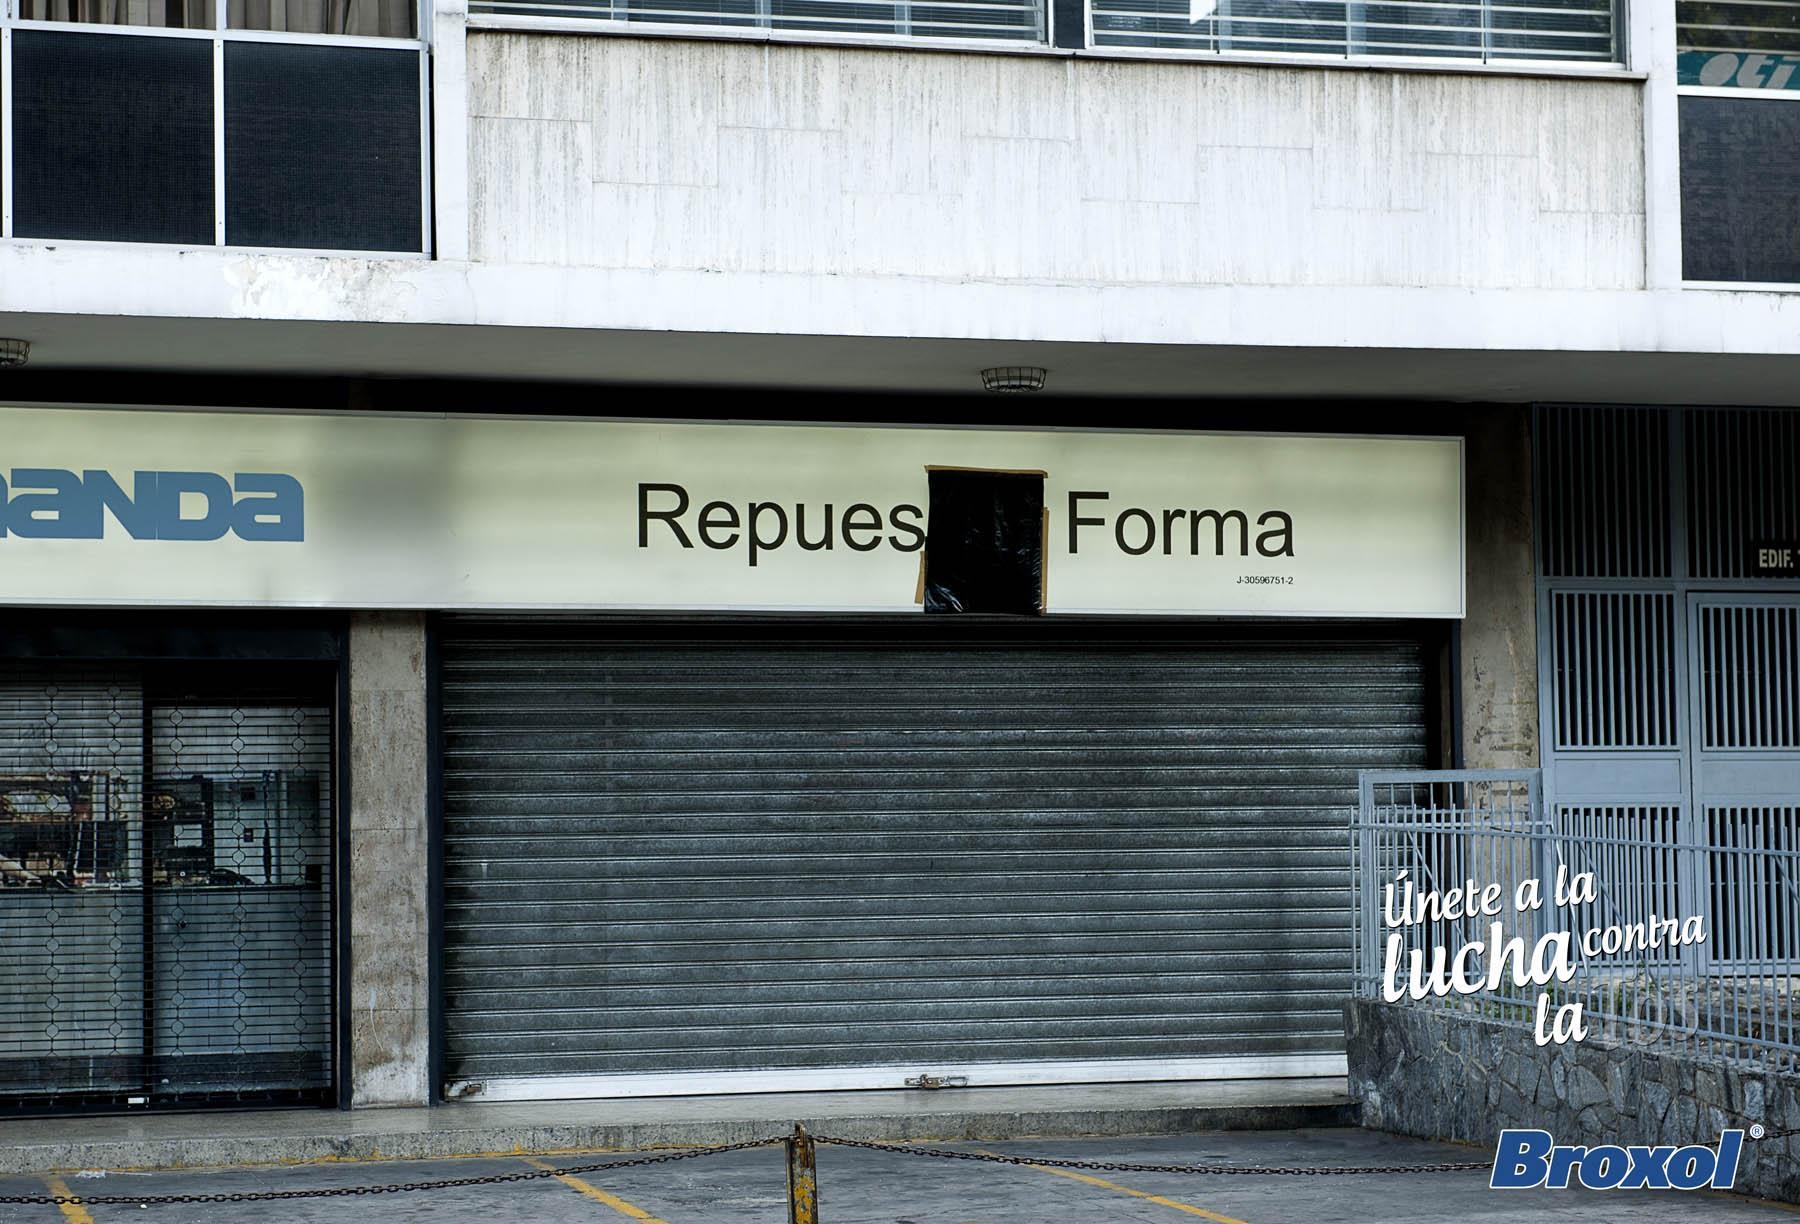 Laboratorio La Santé Print Ad -  Broxol, Sign